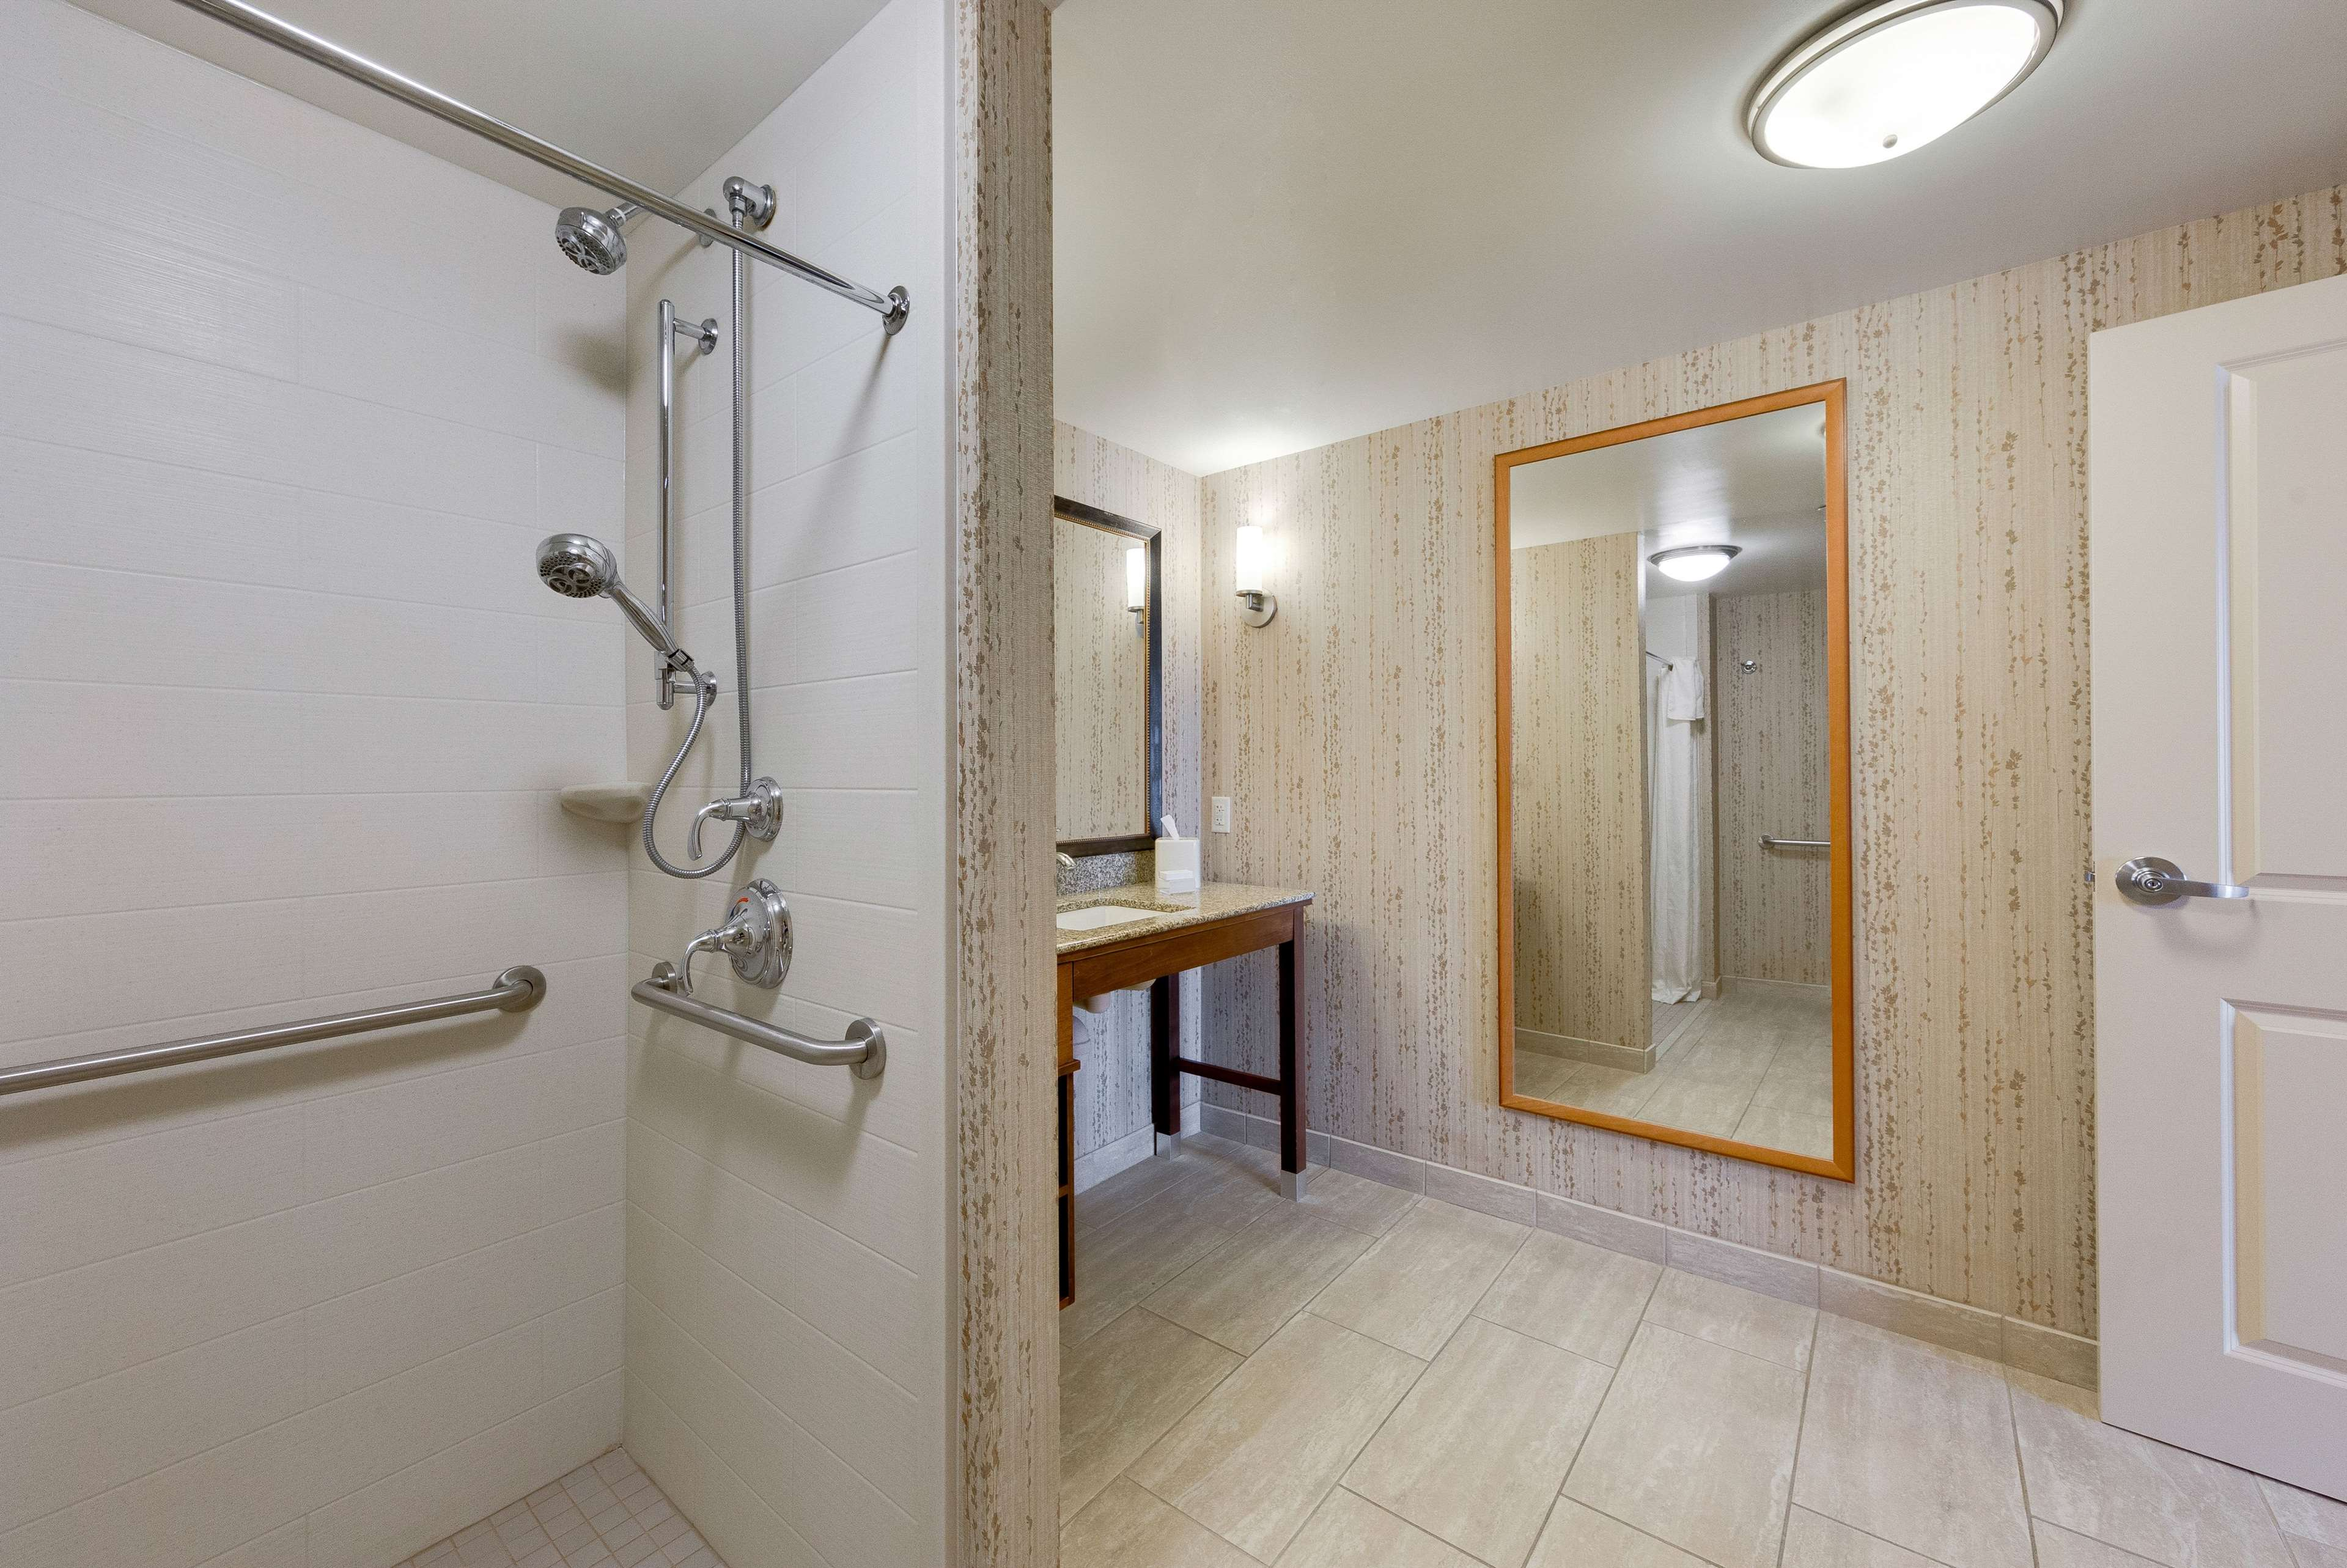 Homewood Suites by Hilton Fort Worth - Medical Center, TX image 17